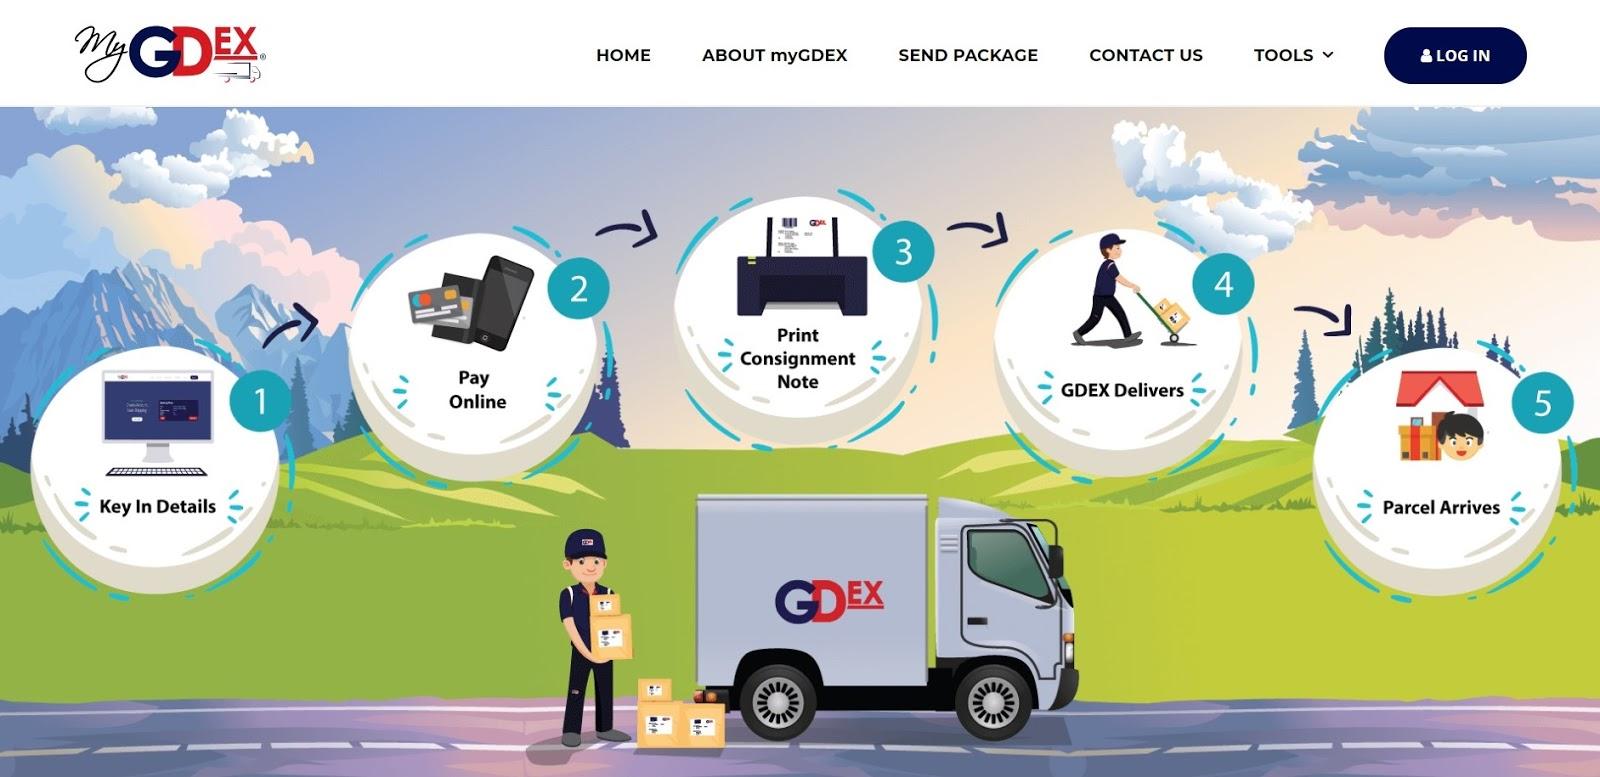 Daftar myGDEX oleh GDEX Express